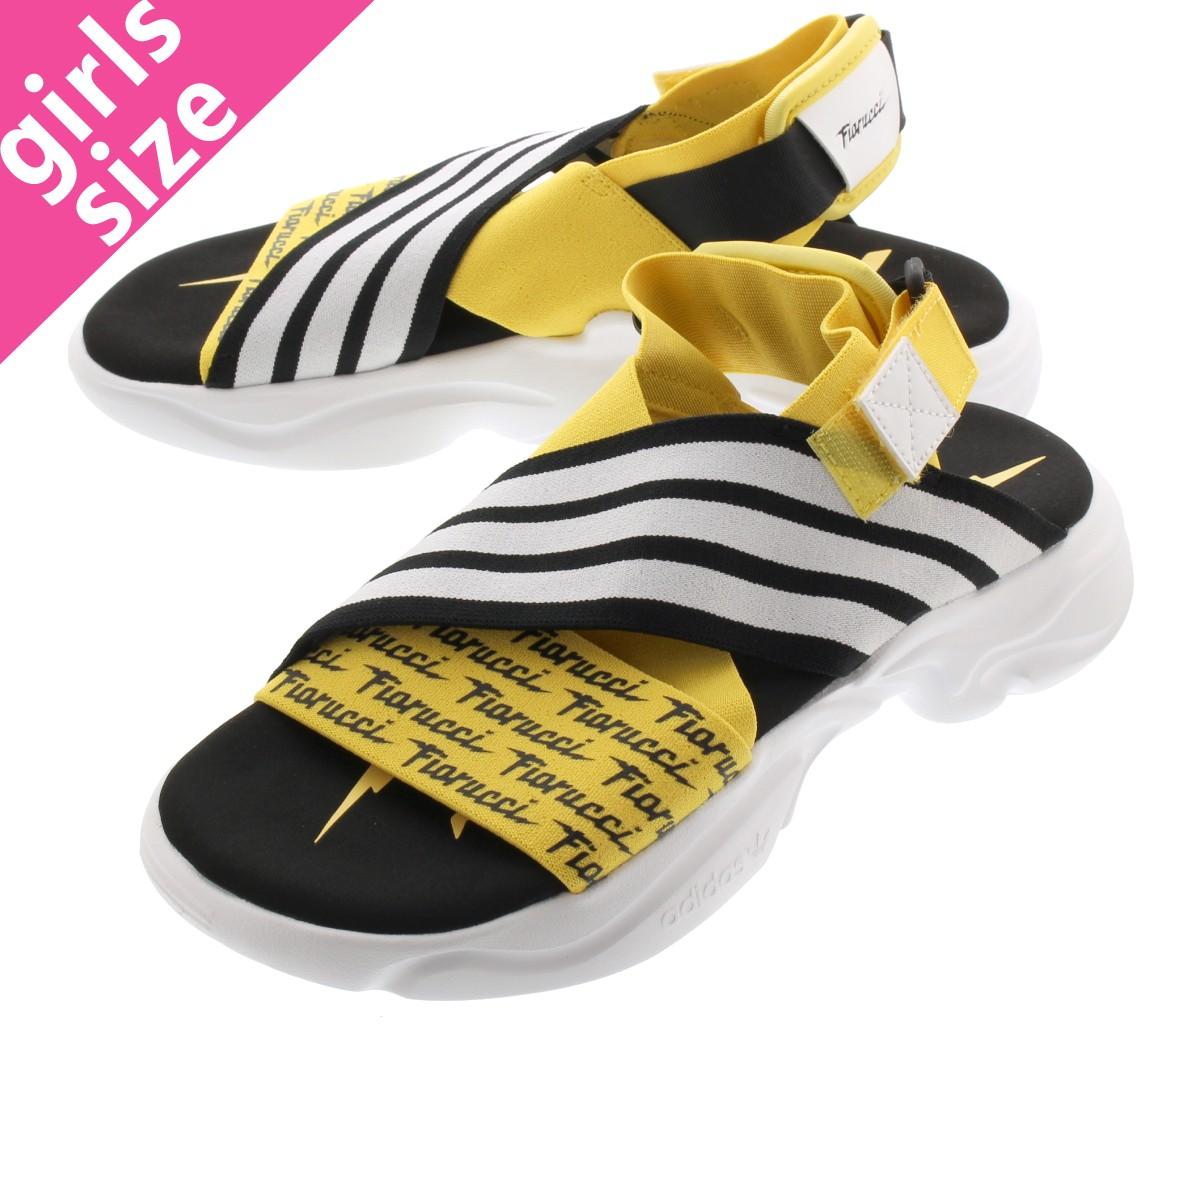 adidas MAGMUR SANDAL W アディダス アマグマ サンダル ウィメンズ CORE YELLOW/FTWR WHITE/CORE BLACK eg6213